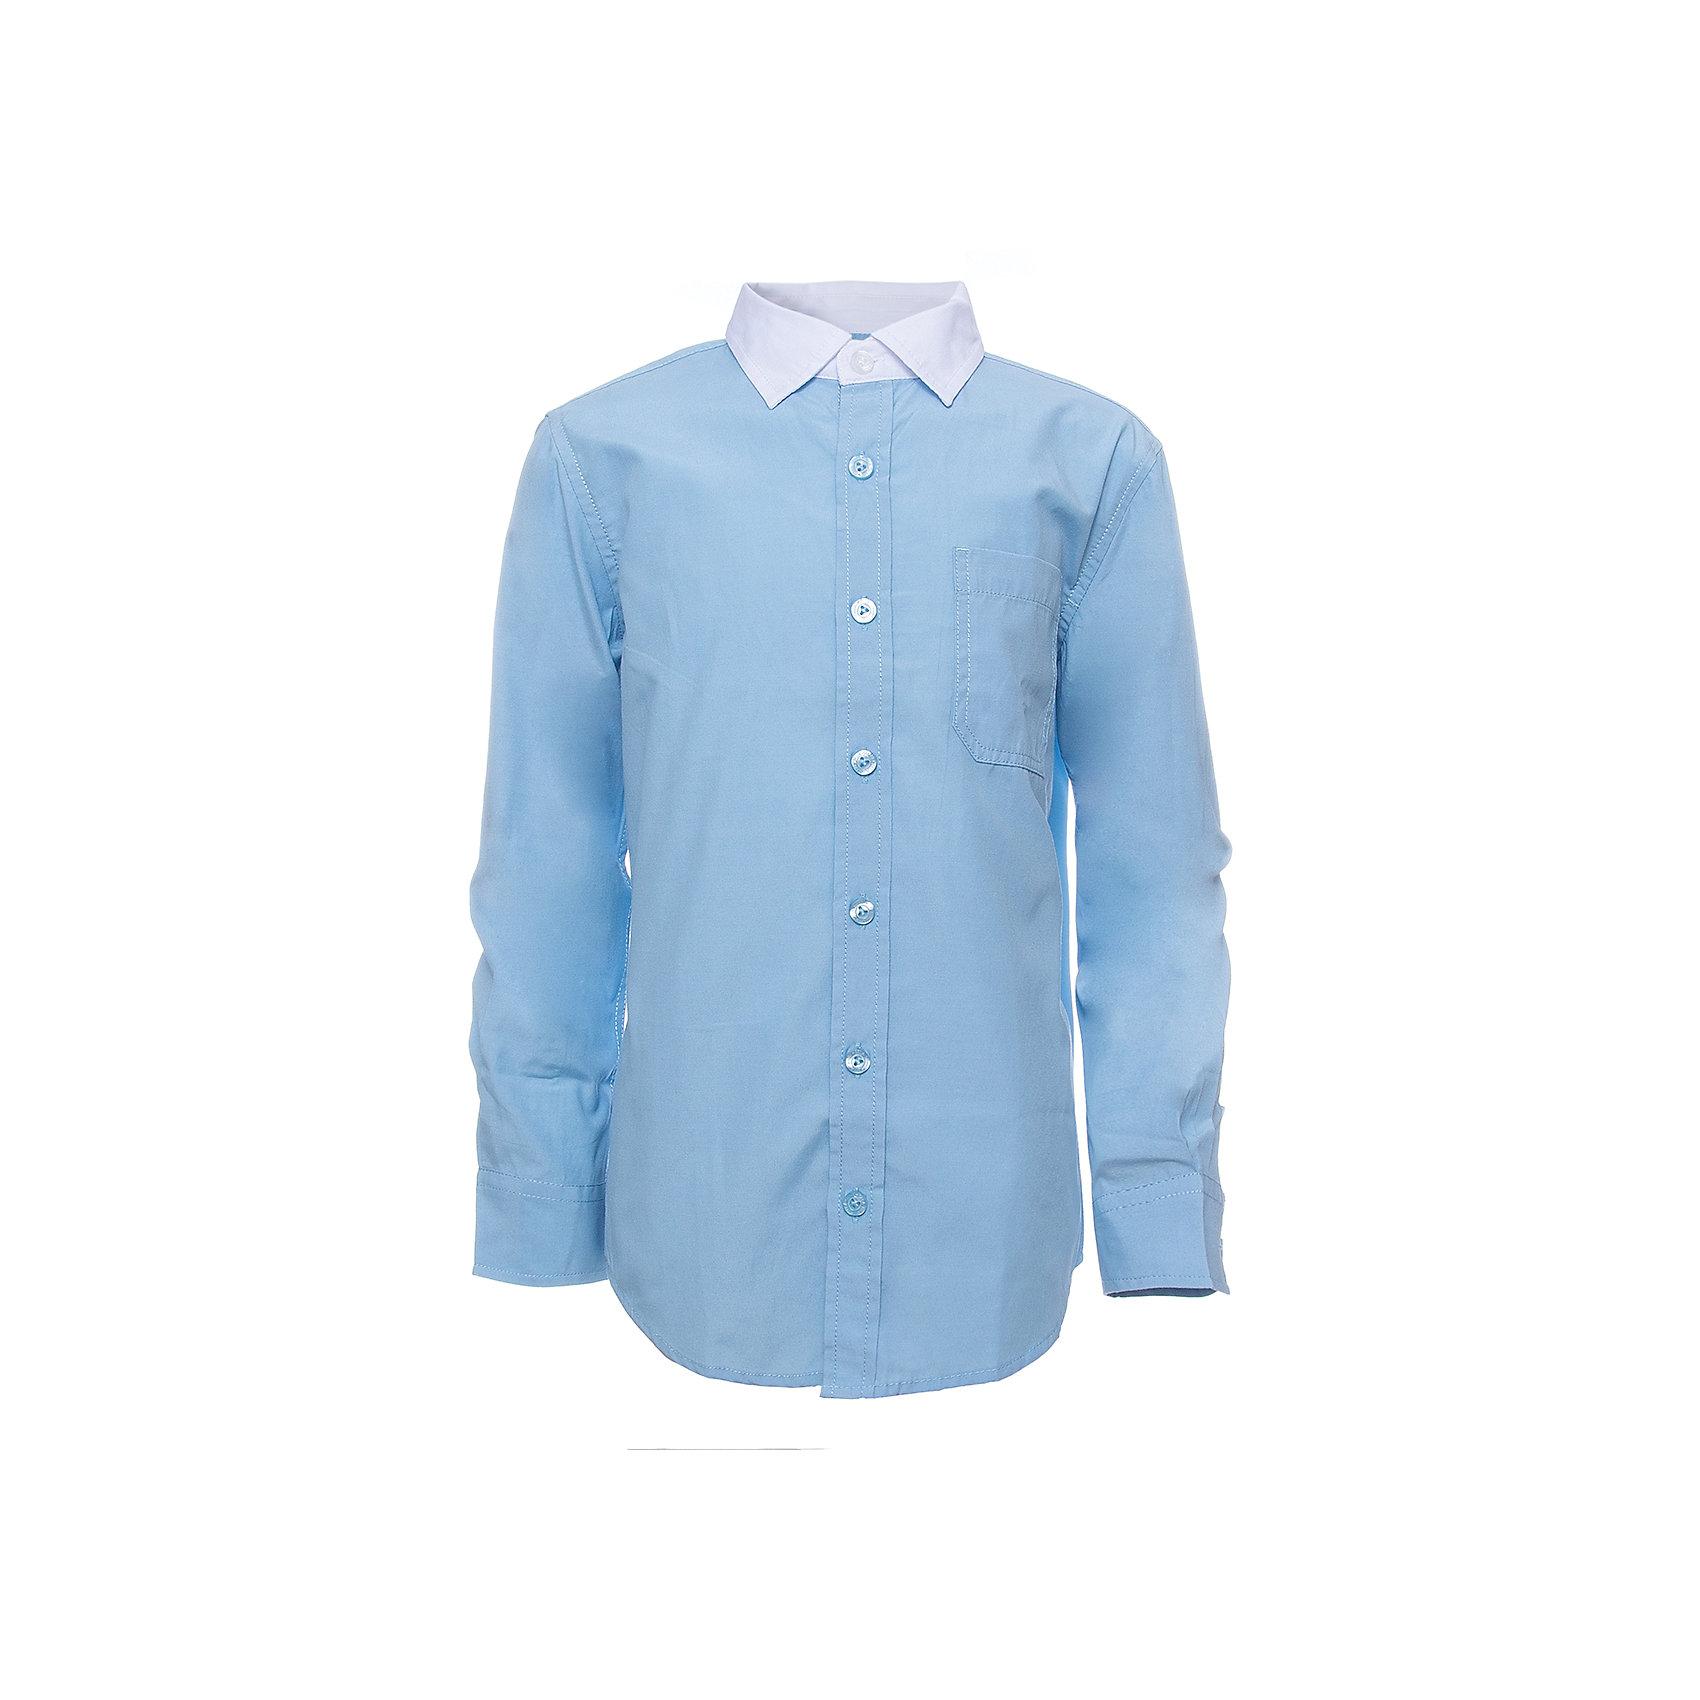 Рубашка SELA для мальчикаБлузки и рубашки<br>Рубашка SELA для мальчика<br>Состав:<br>60% хлопок, 40% ПЭ<br><br>Ширина мм: 174<br>Глубина мм: 10<br>Высота мм: 169<br>Вес г: 157<br>Цвет: голубой<br>Возраст от месяцев: 72<br>Возраст до месяцев: 84<br>Пол: Мужской<br>Возраст: Детский<br>Размер: 122,170,164,158,152,146,140,134,128<br>SKU: 7032323